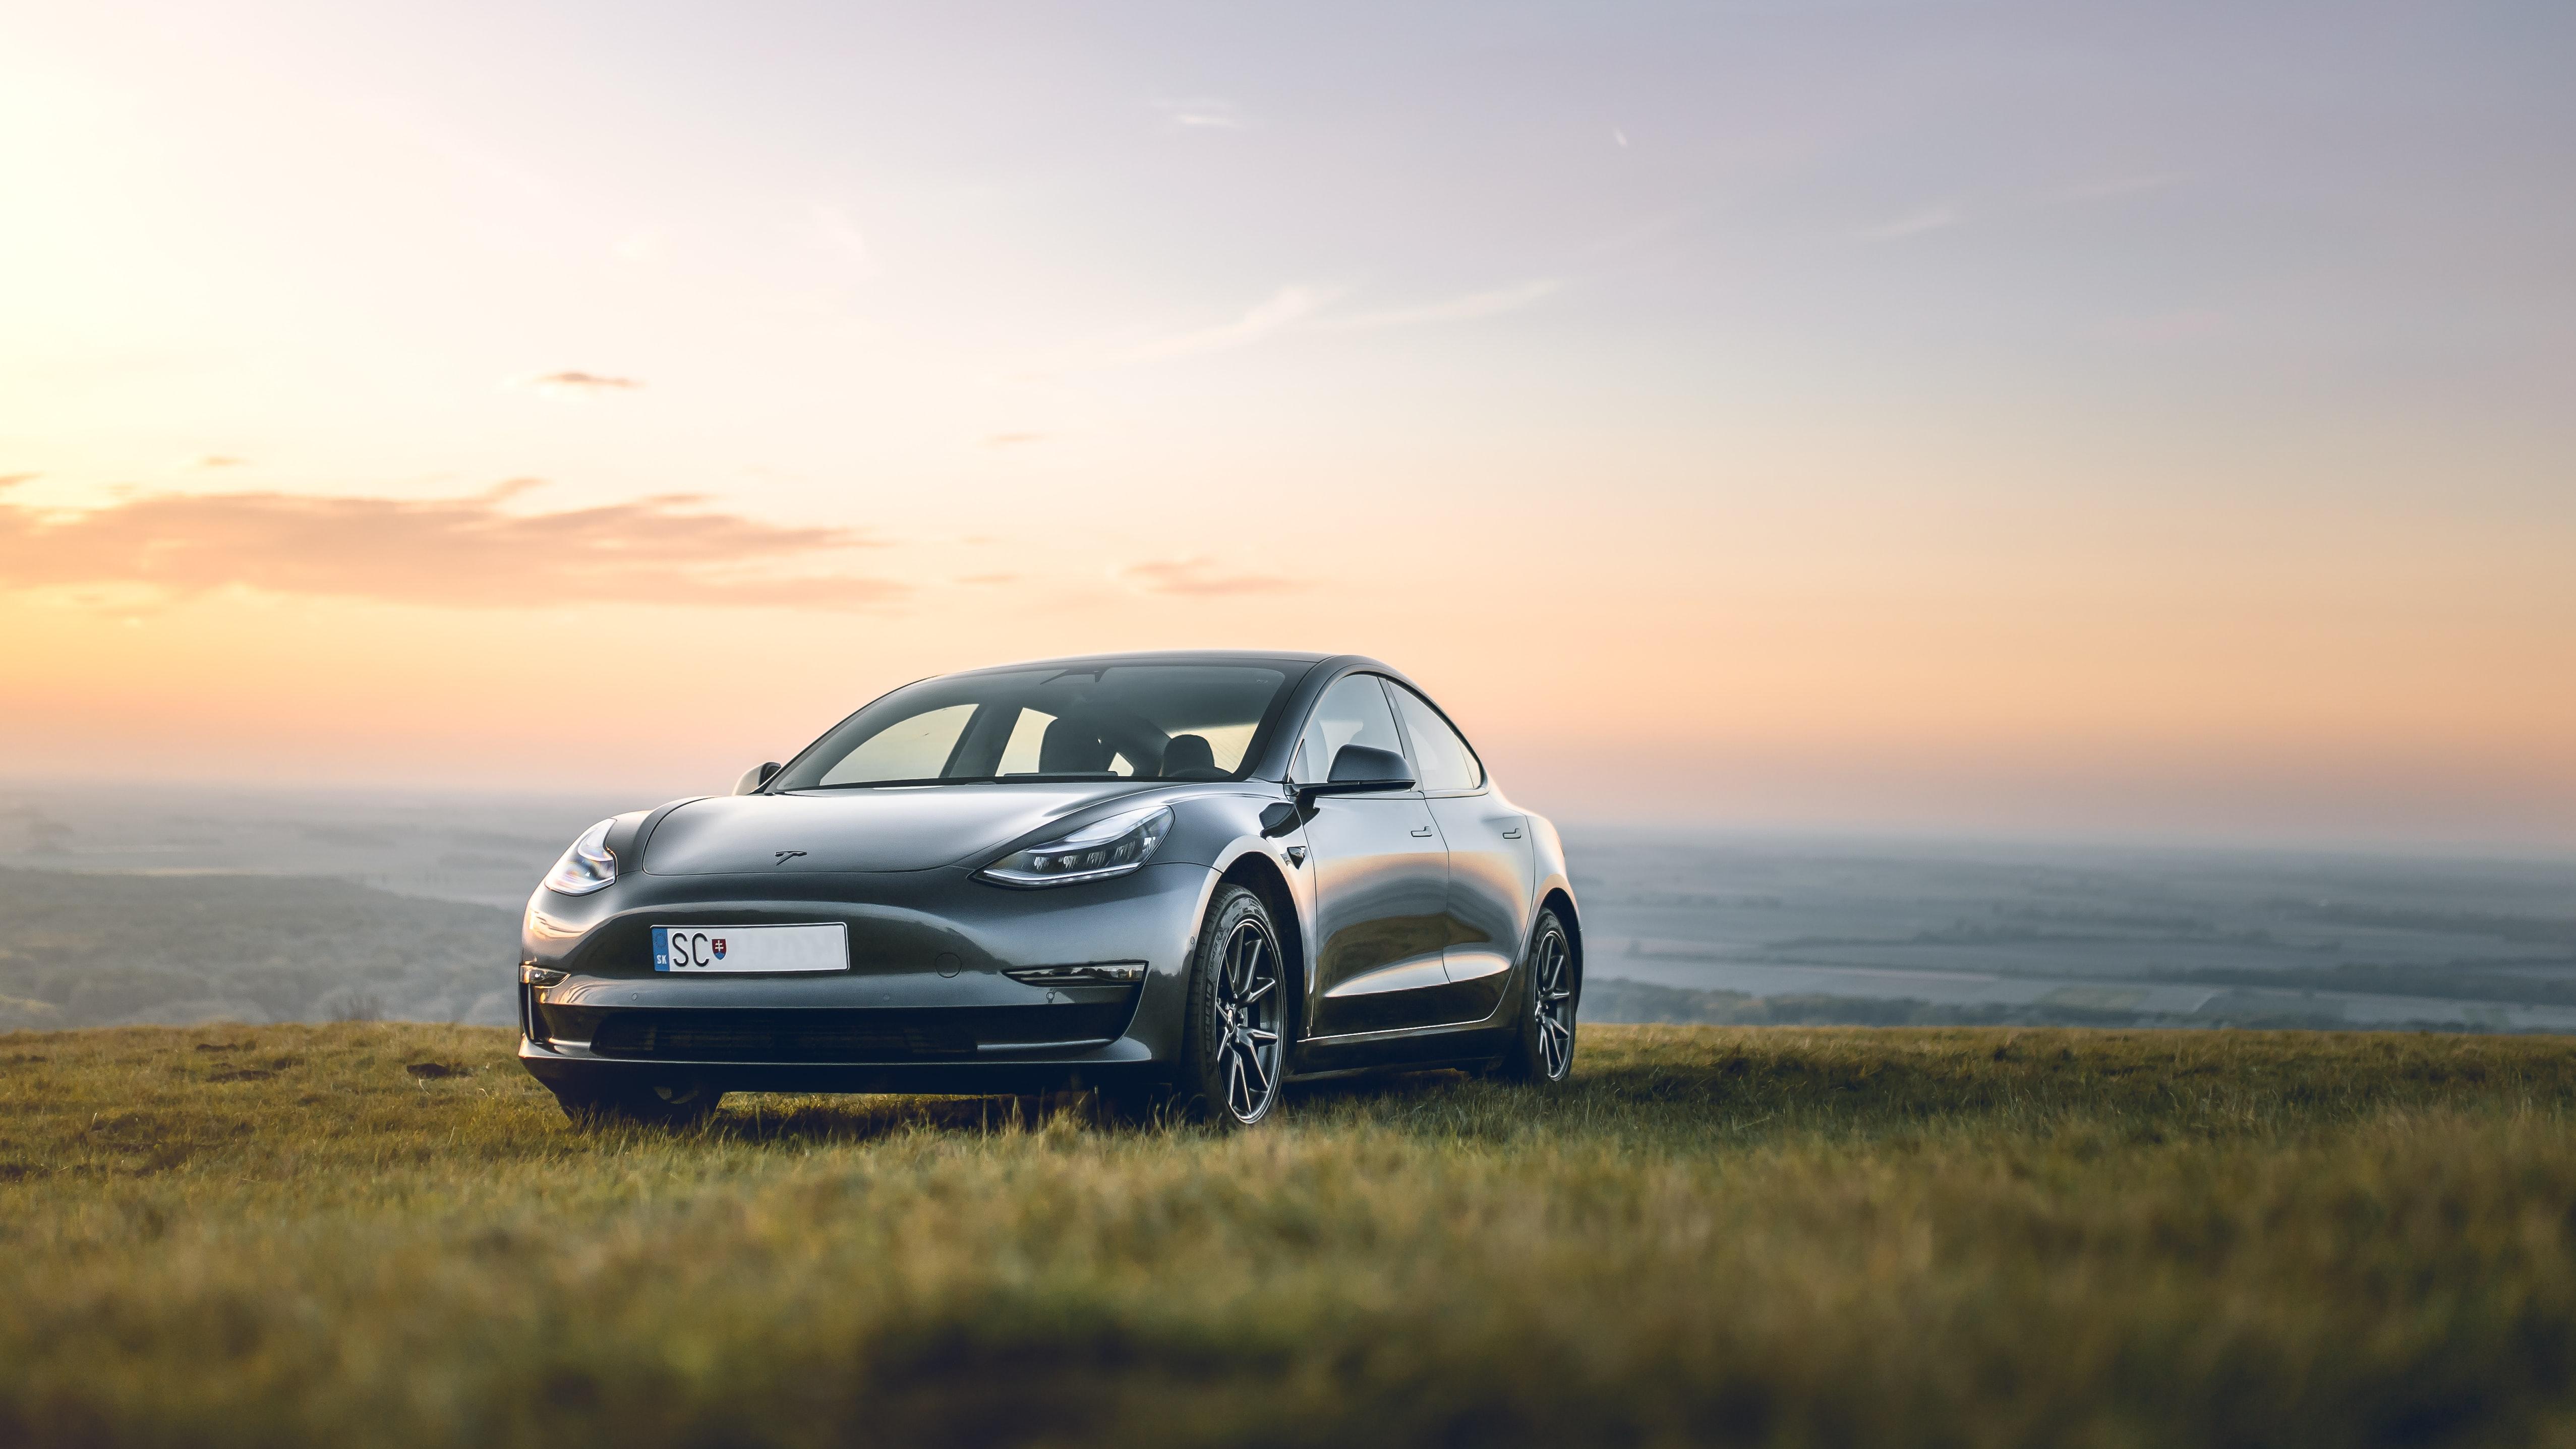 Full Hd Tesla Car Wallpaper Wallpress Free Wallpaper Site